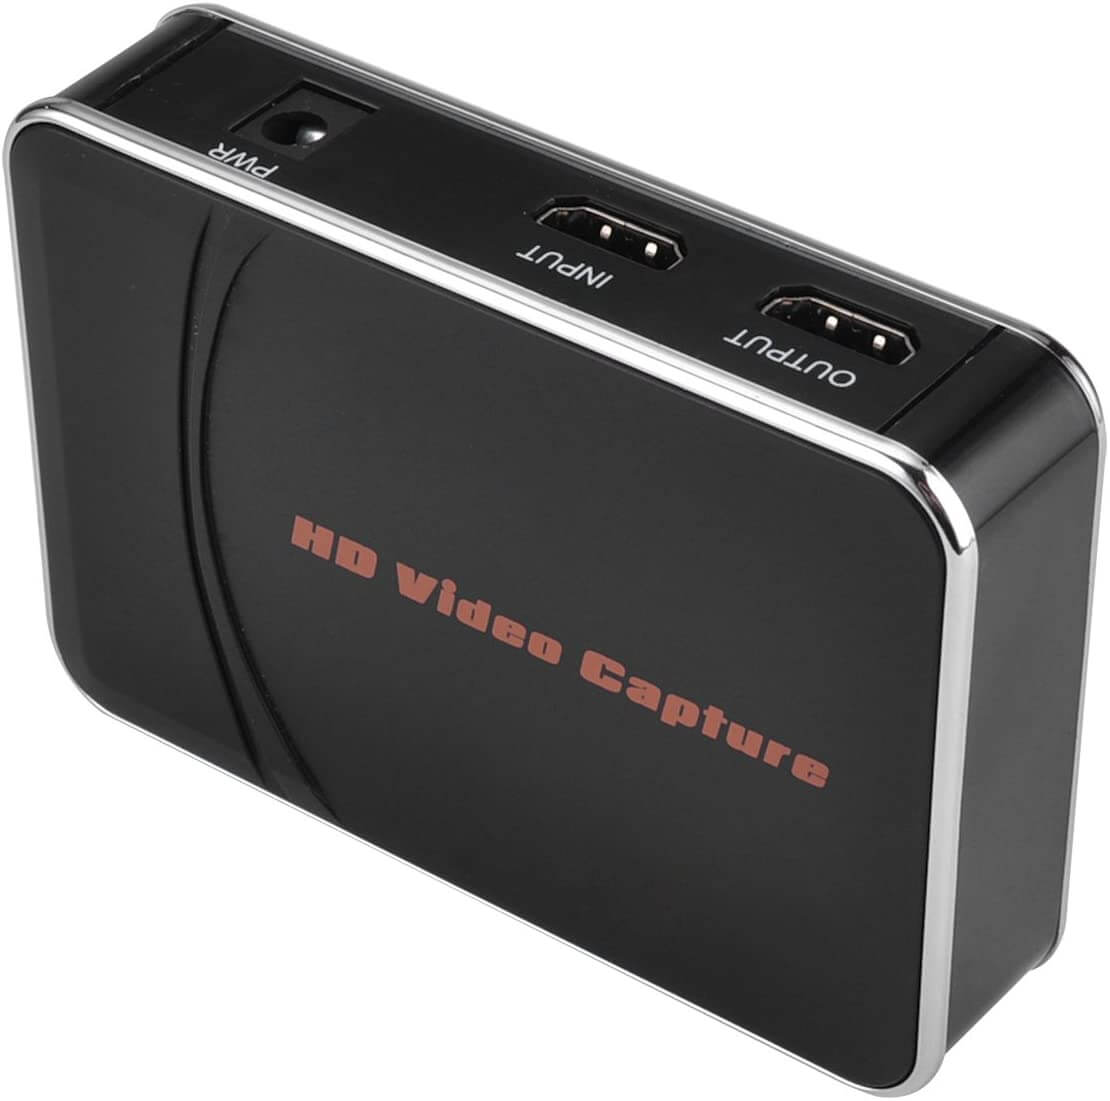 قیمت خرید کارت کپچر HDMI مدل EZCAP280HB